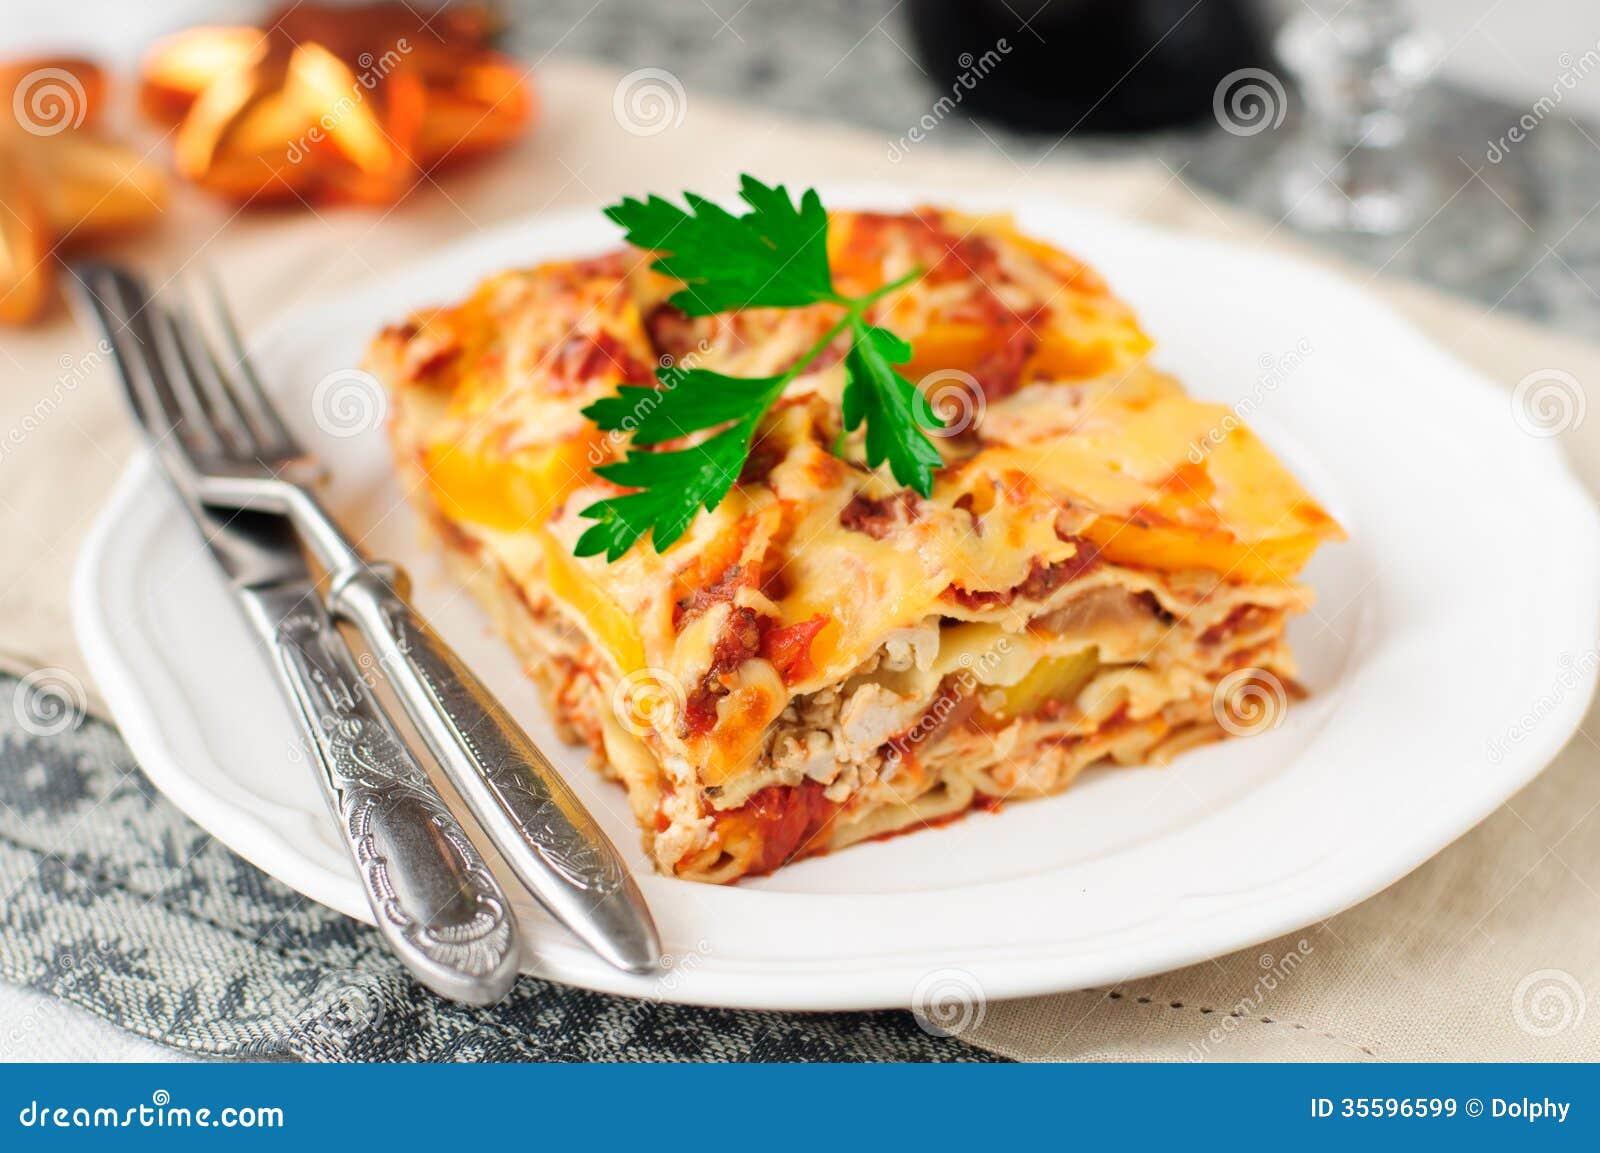 chicken and pumpkin lasagna christmas dinner - Classic Christmas Dinner